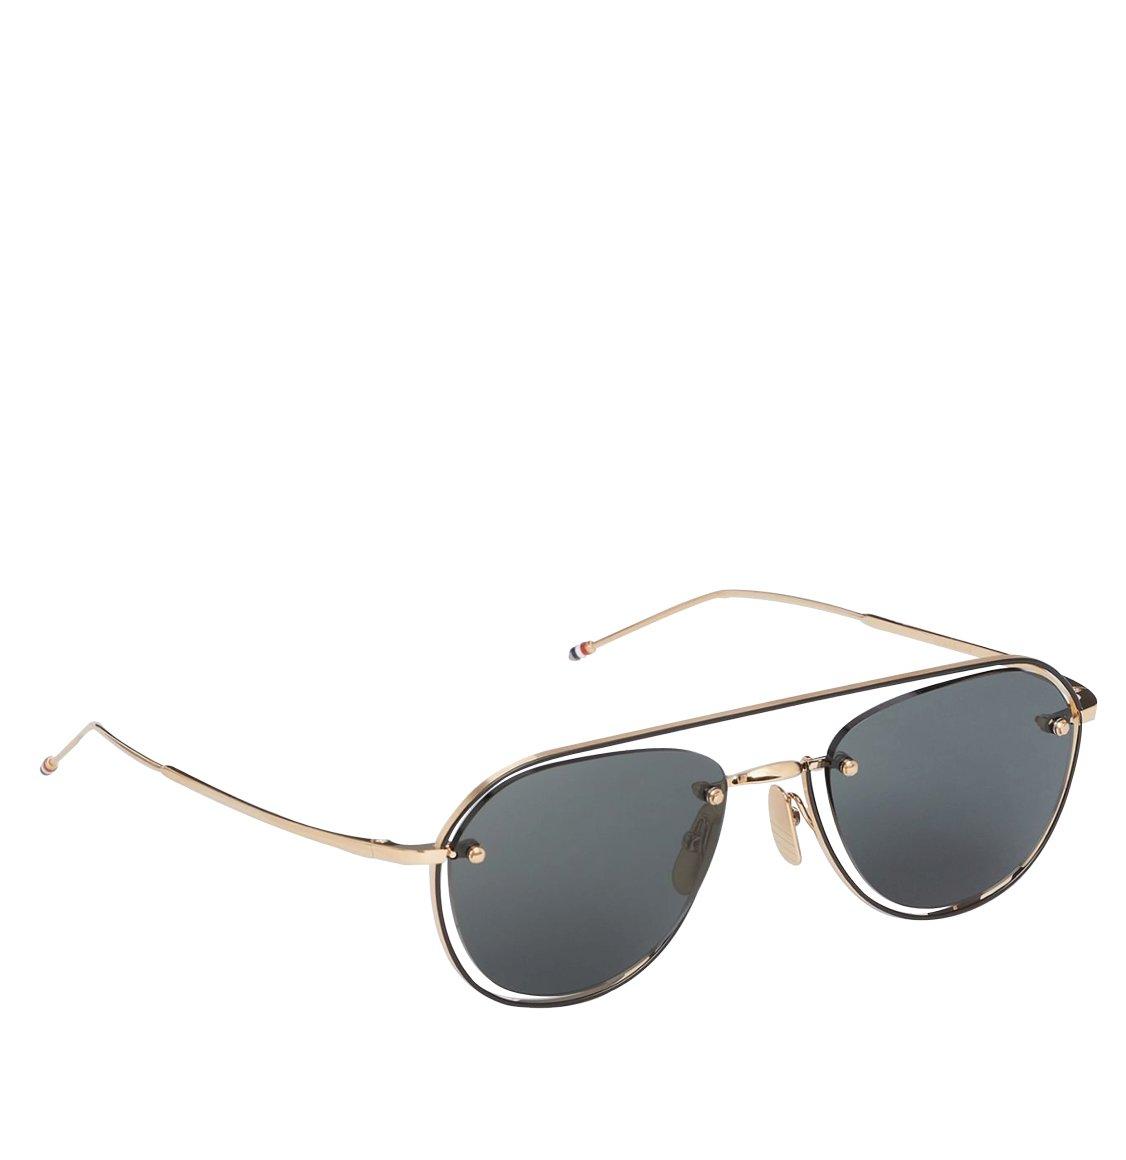 Thom Browne White Gold And Black Enamel Aviator Sunglasses Γυαλιά Ηλίου